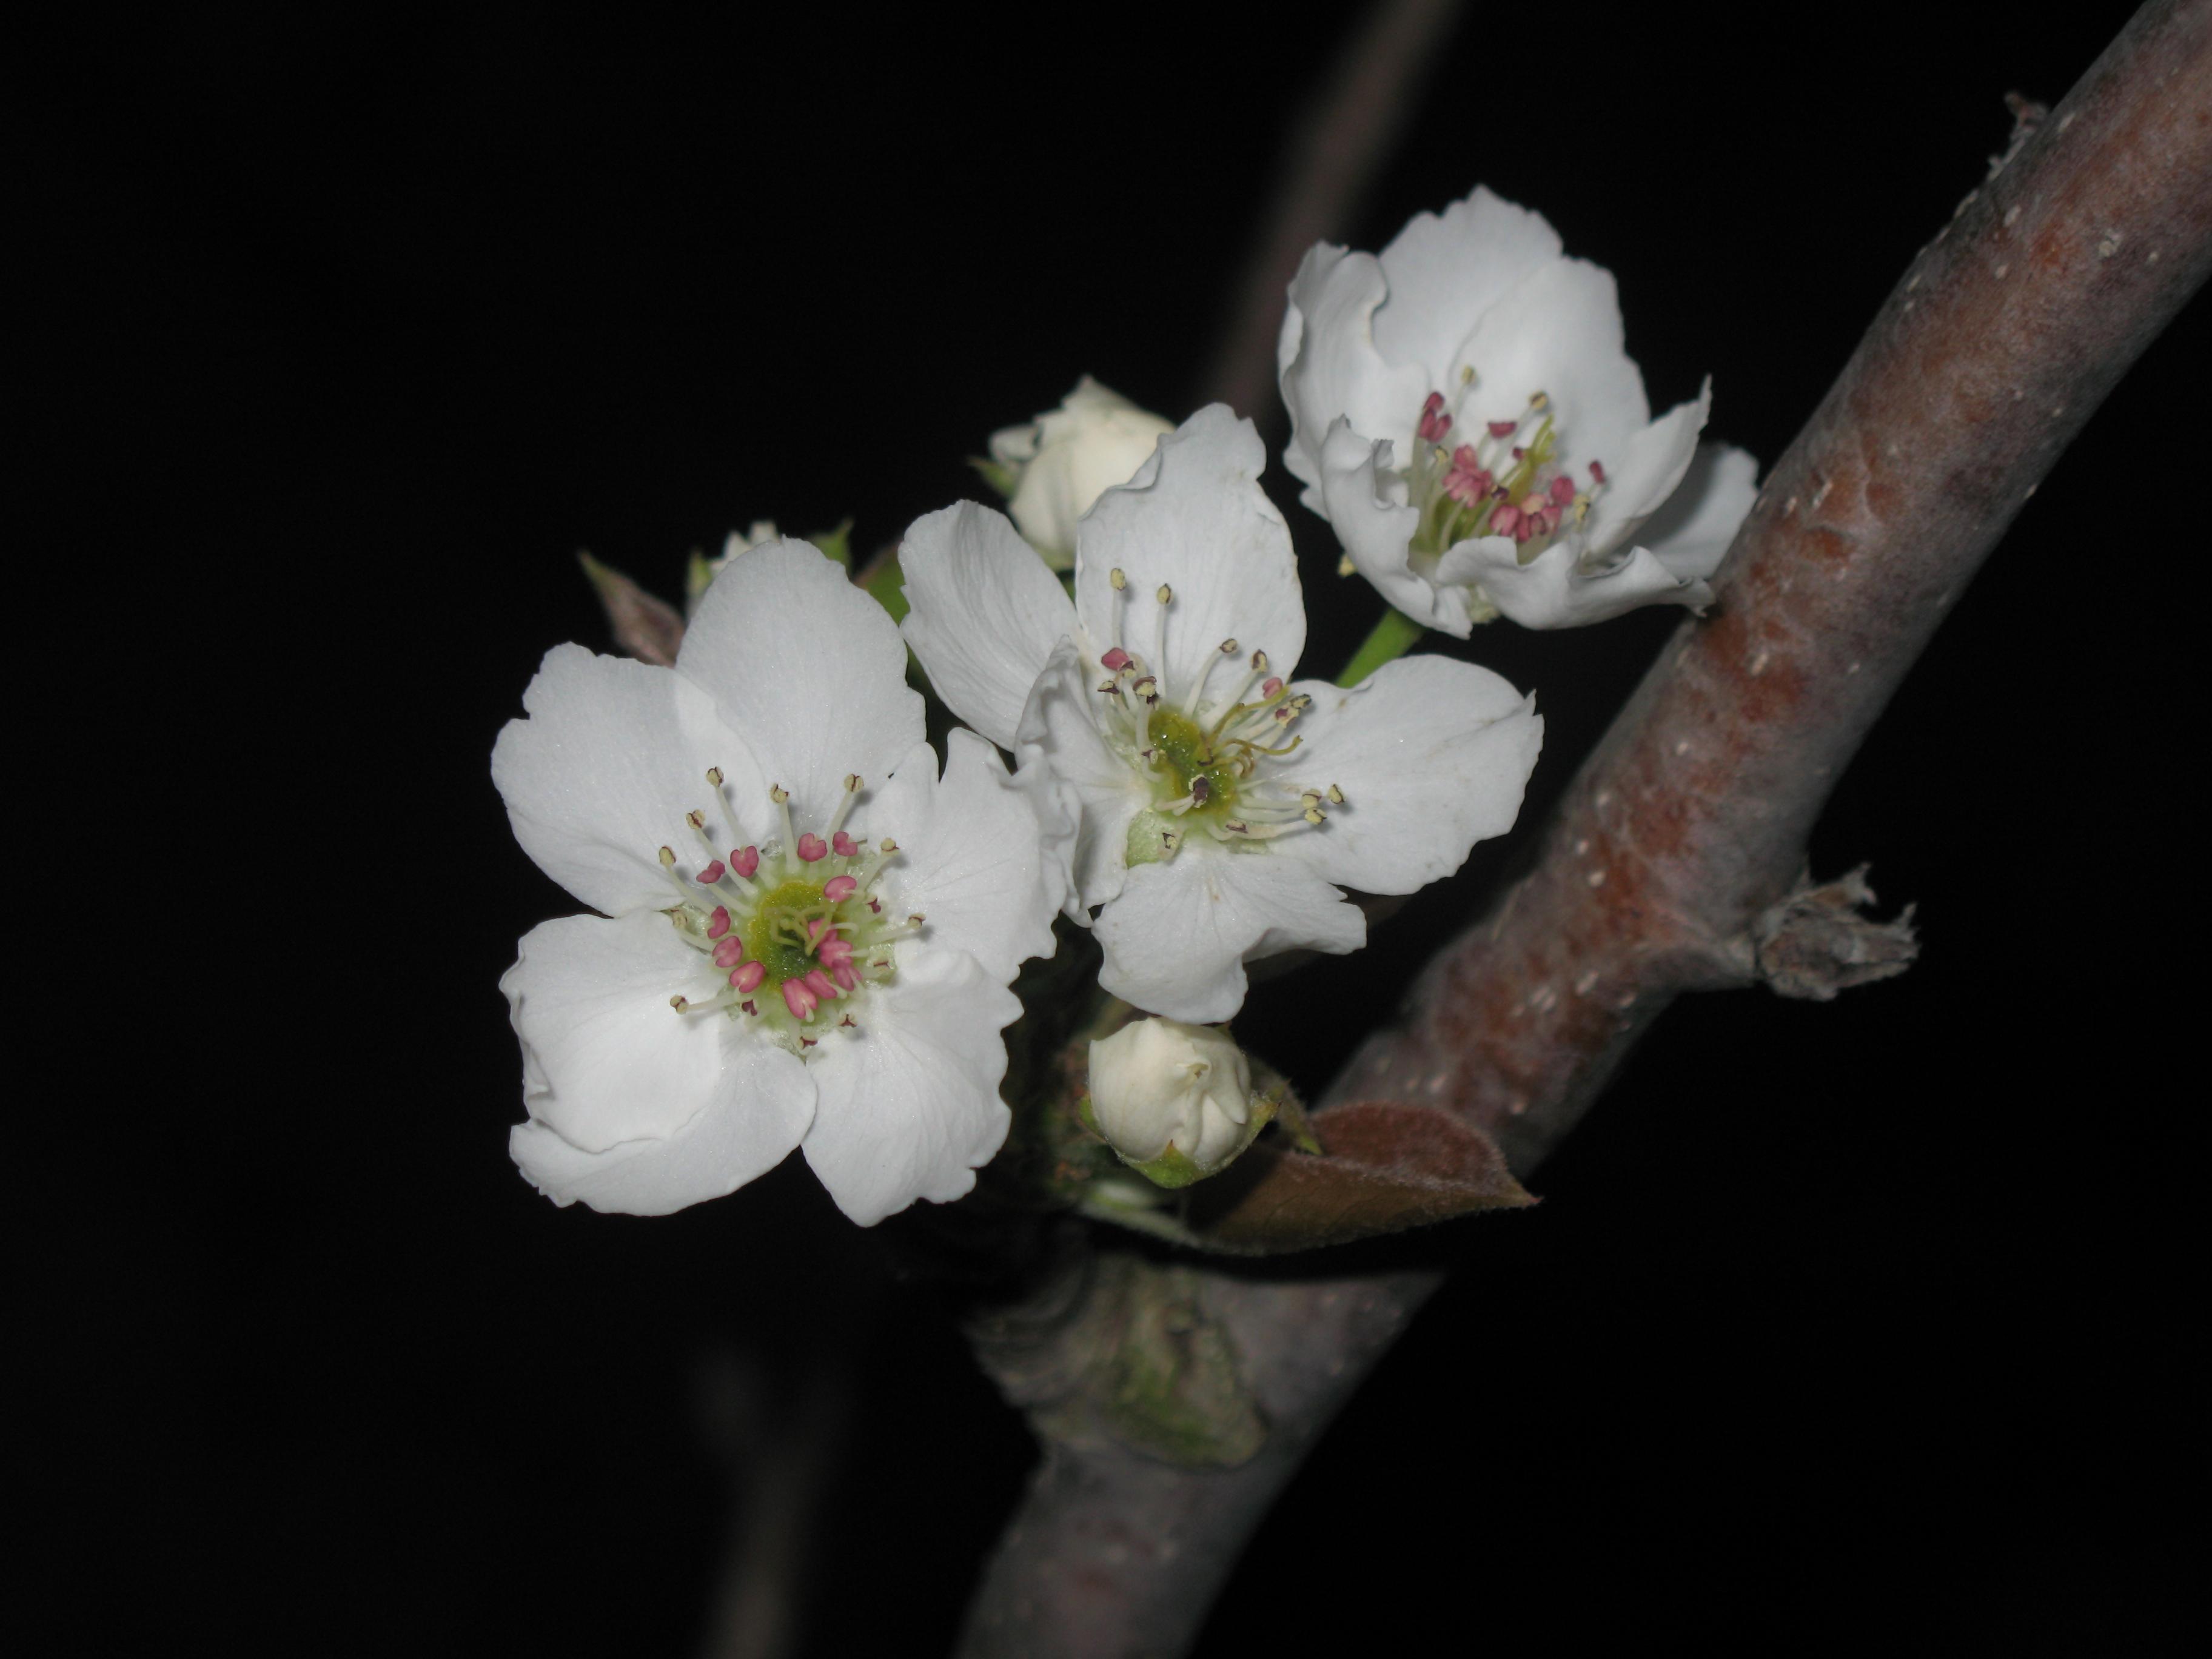 Nature simplistic beauty, Bloom, Flower, Life, Nature, HQ Photo